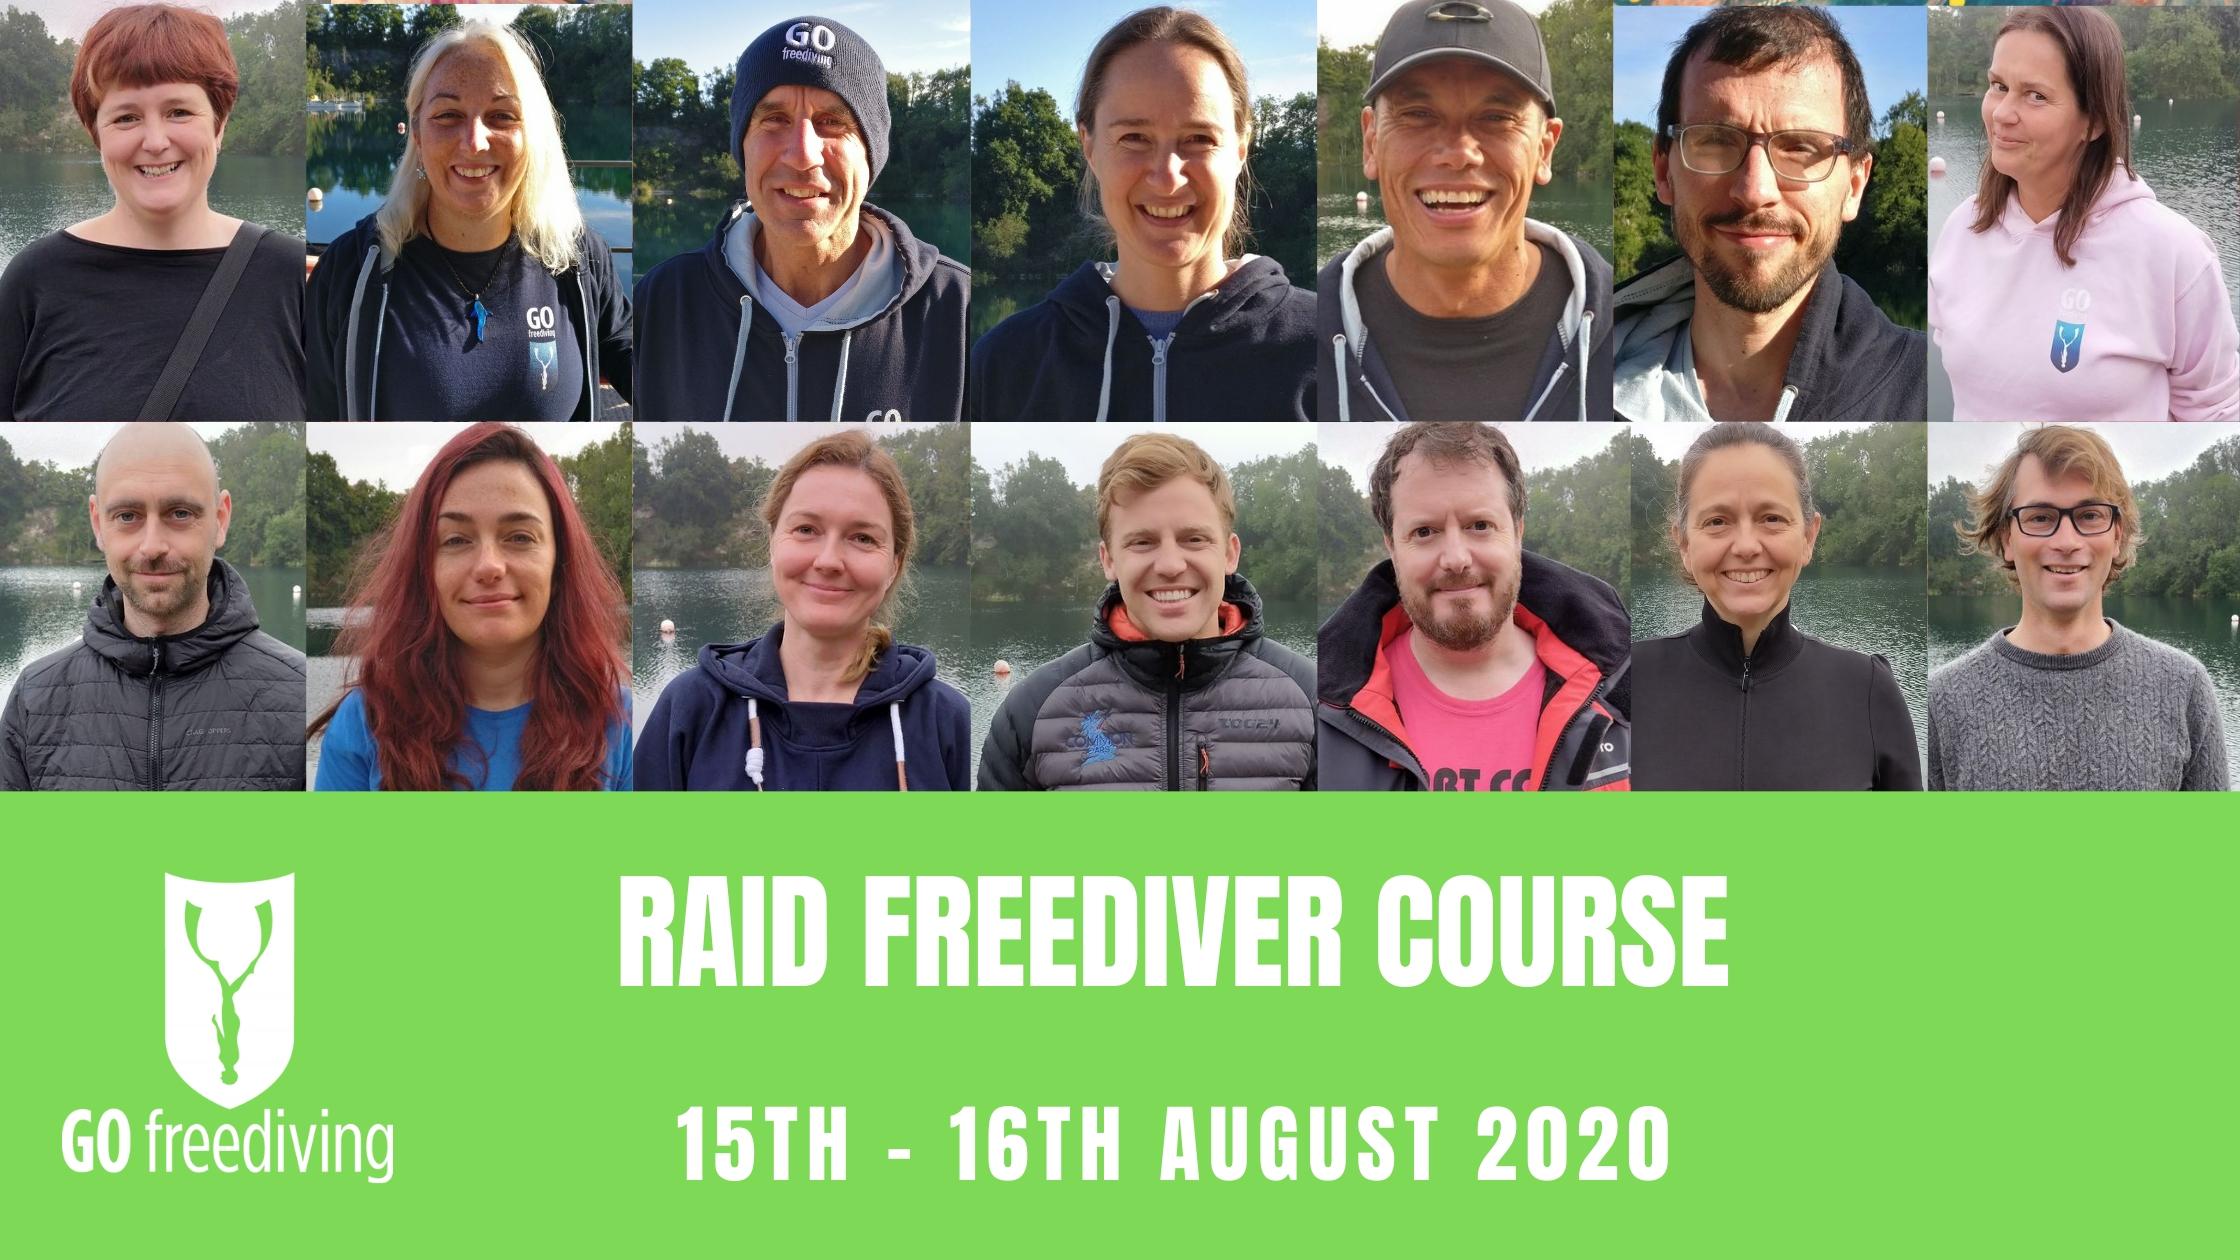 RAID Freediver Course 15 August 2020